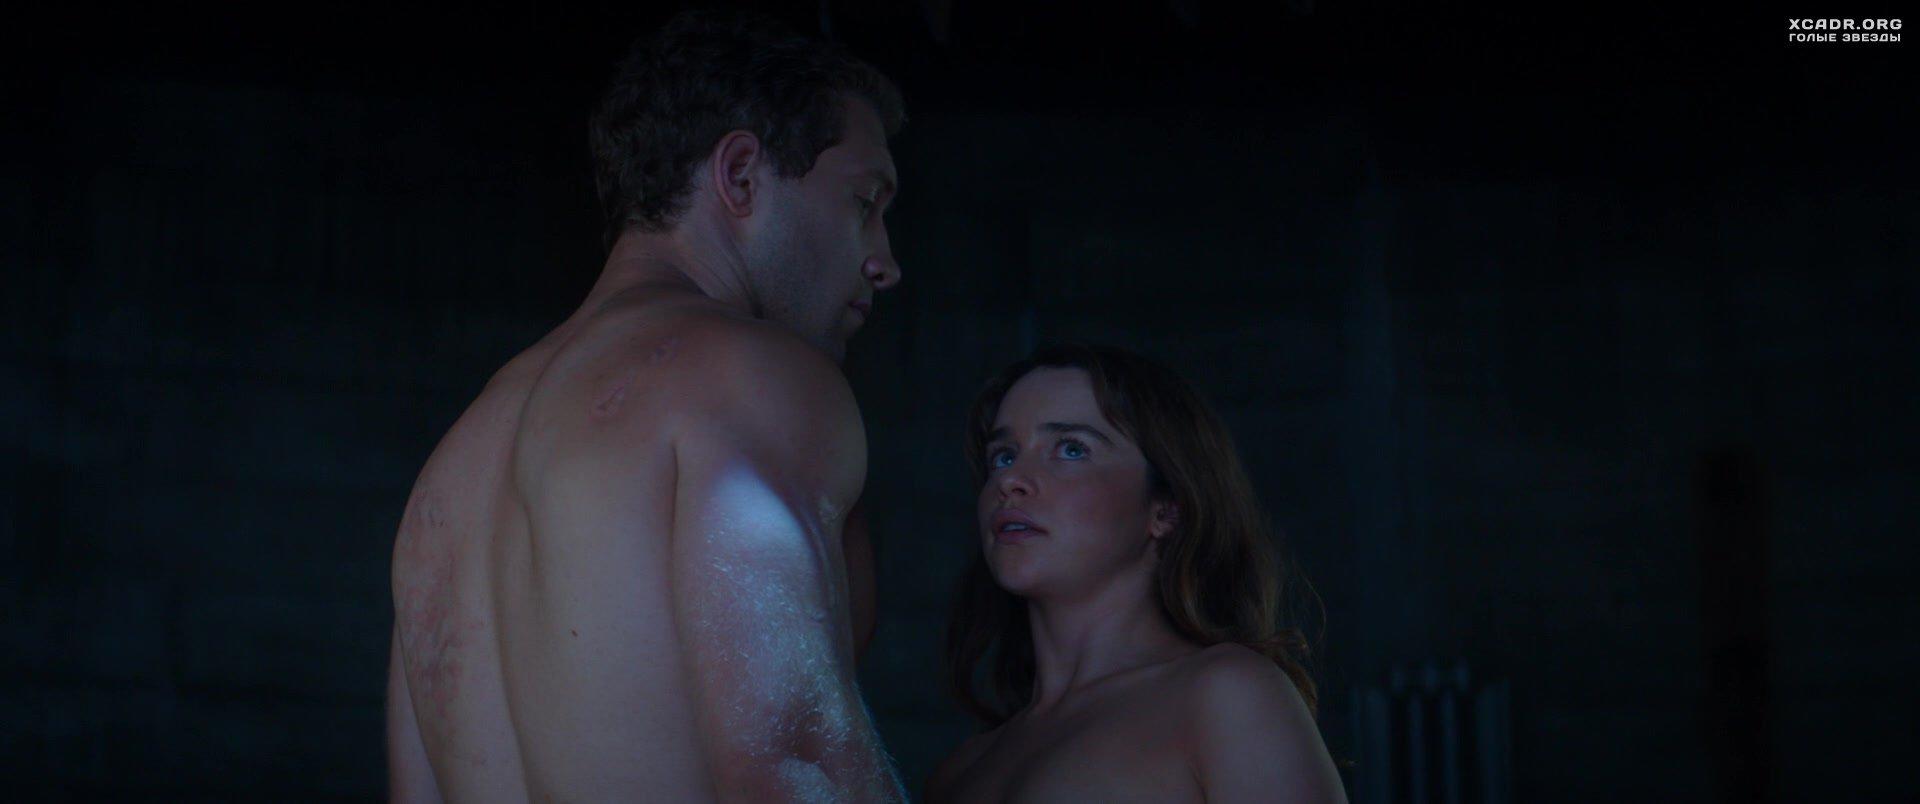 terminator-movie-sex-scene